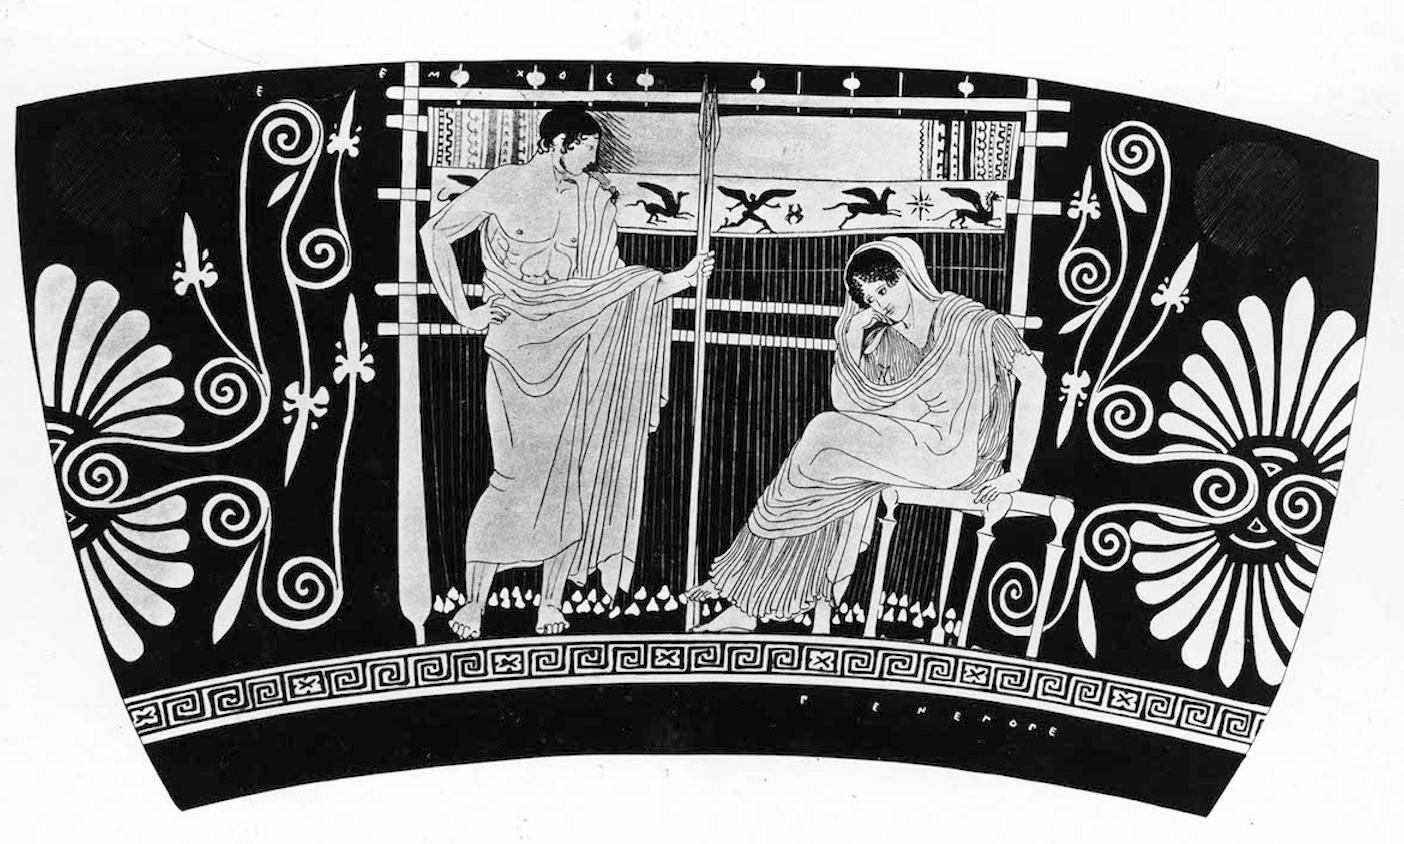 Classical Studies image 2 - Andrea McCann.png